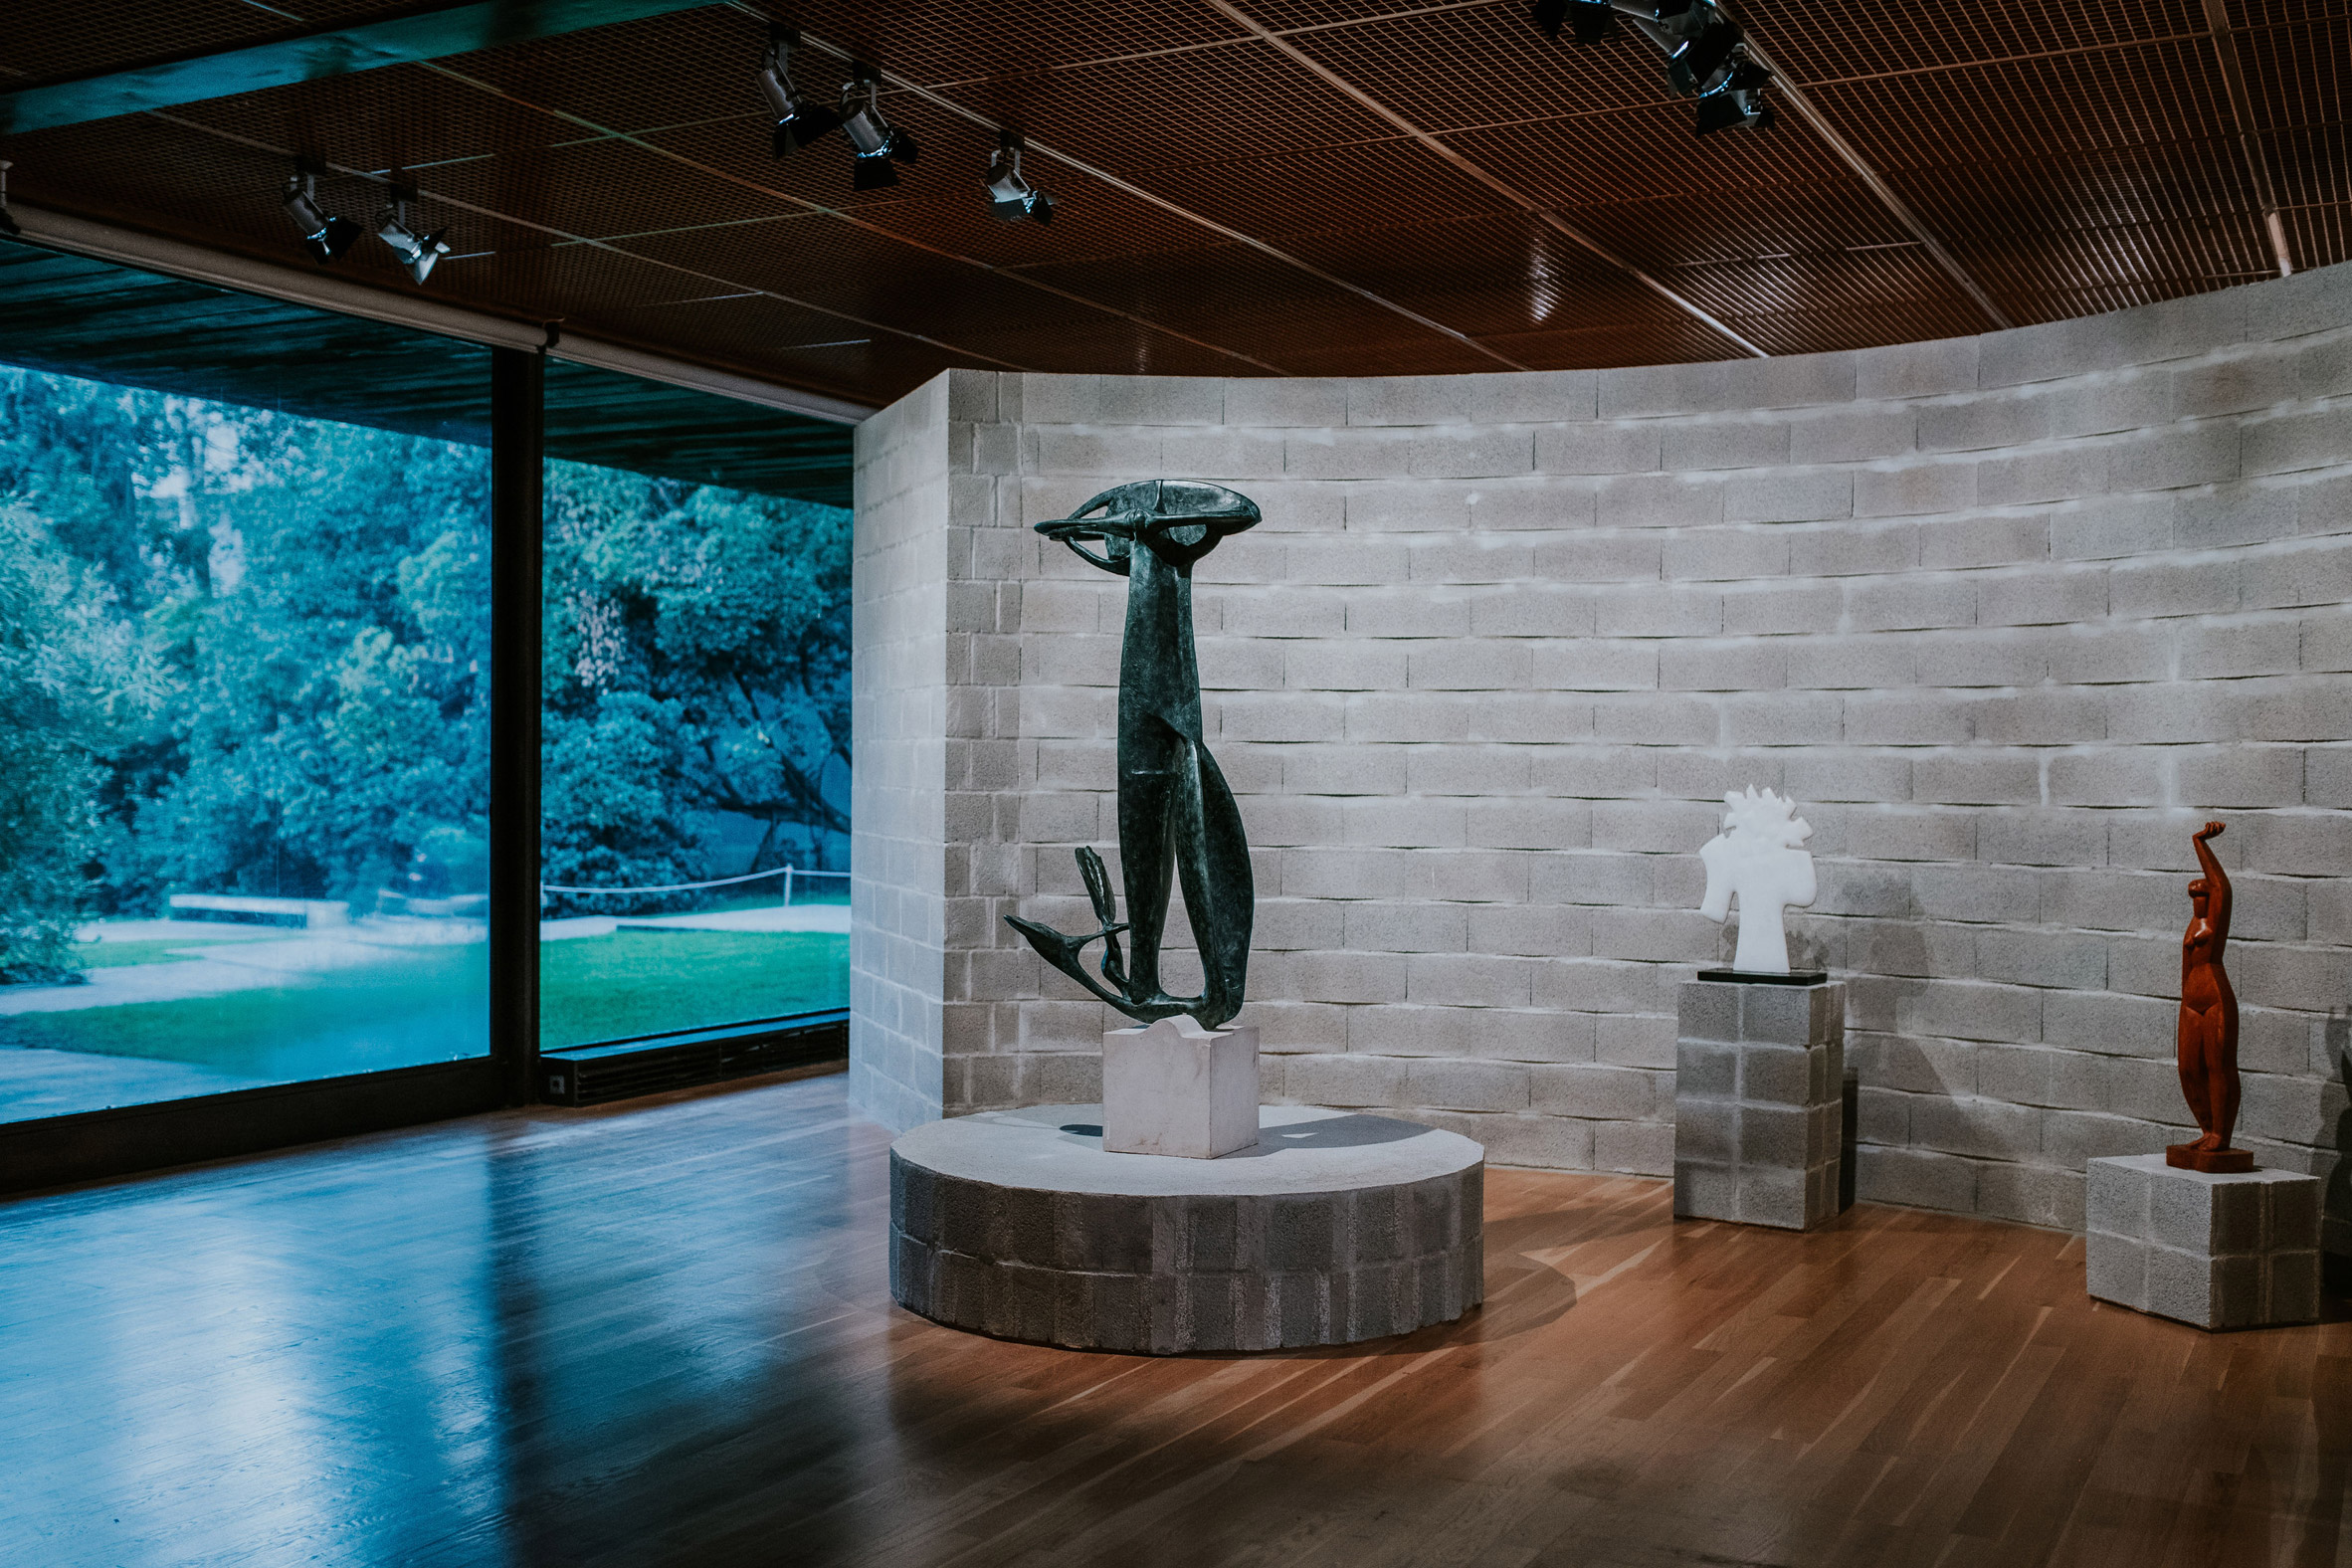 Art on Display at the Gulbenkian Museum